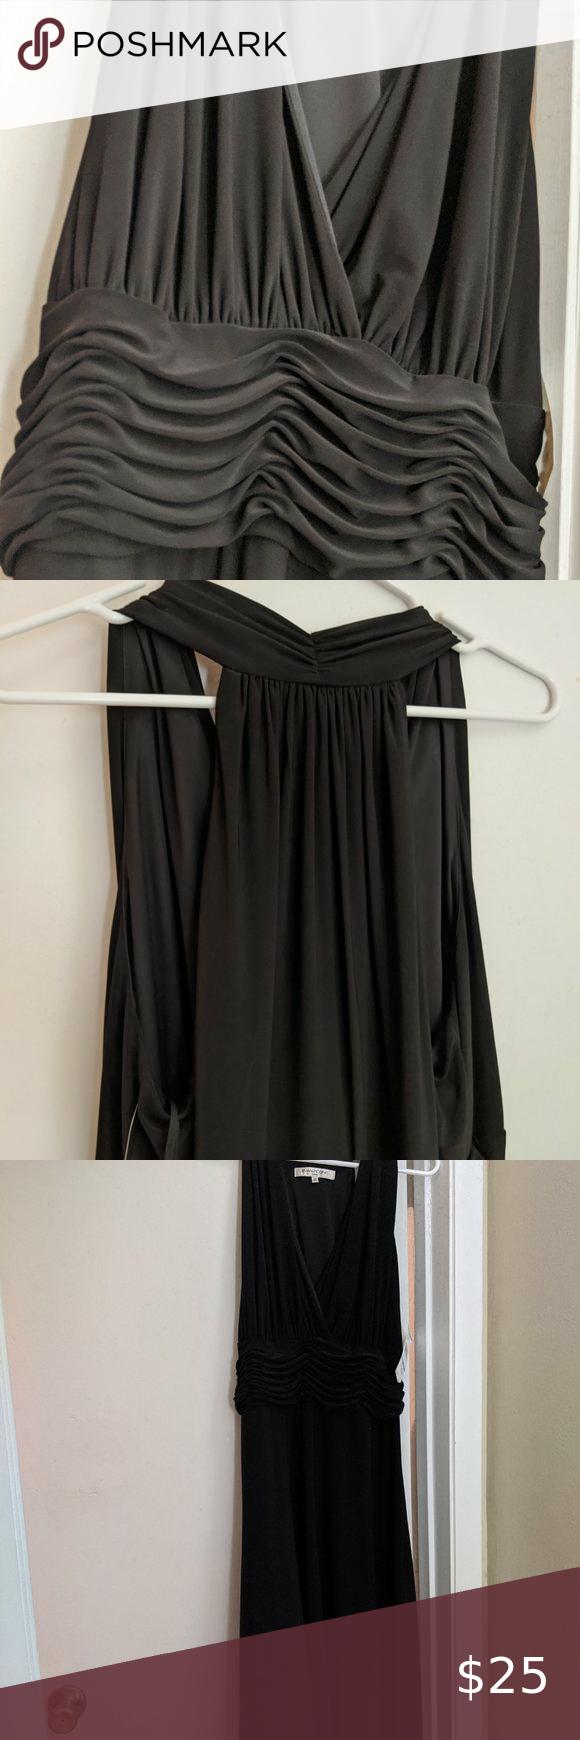 Lbd Little Black Dress Size 16 Little Black Dress Black Dress Size 16 Dresses [ 1740 x 580 Pixel ]